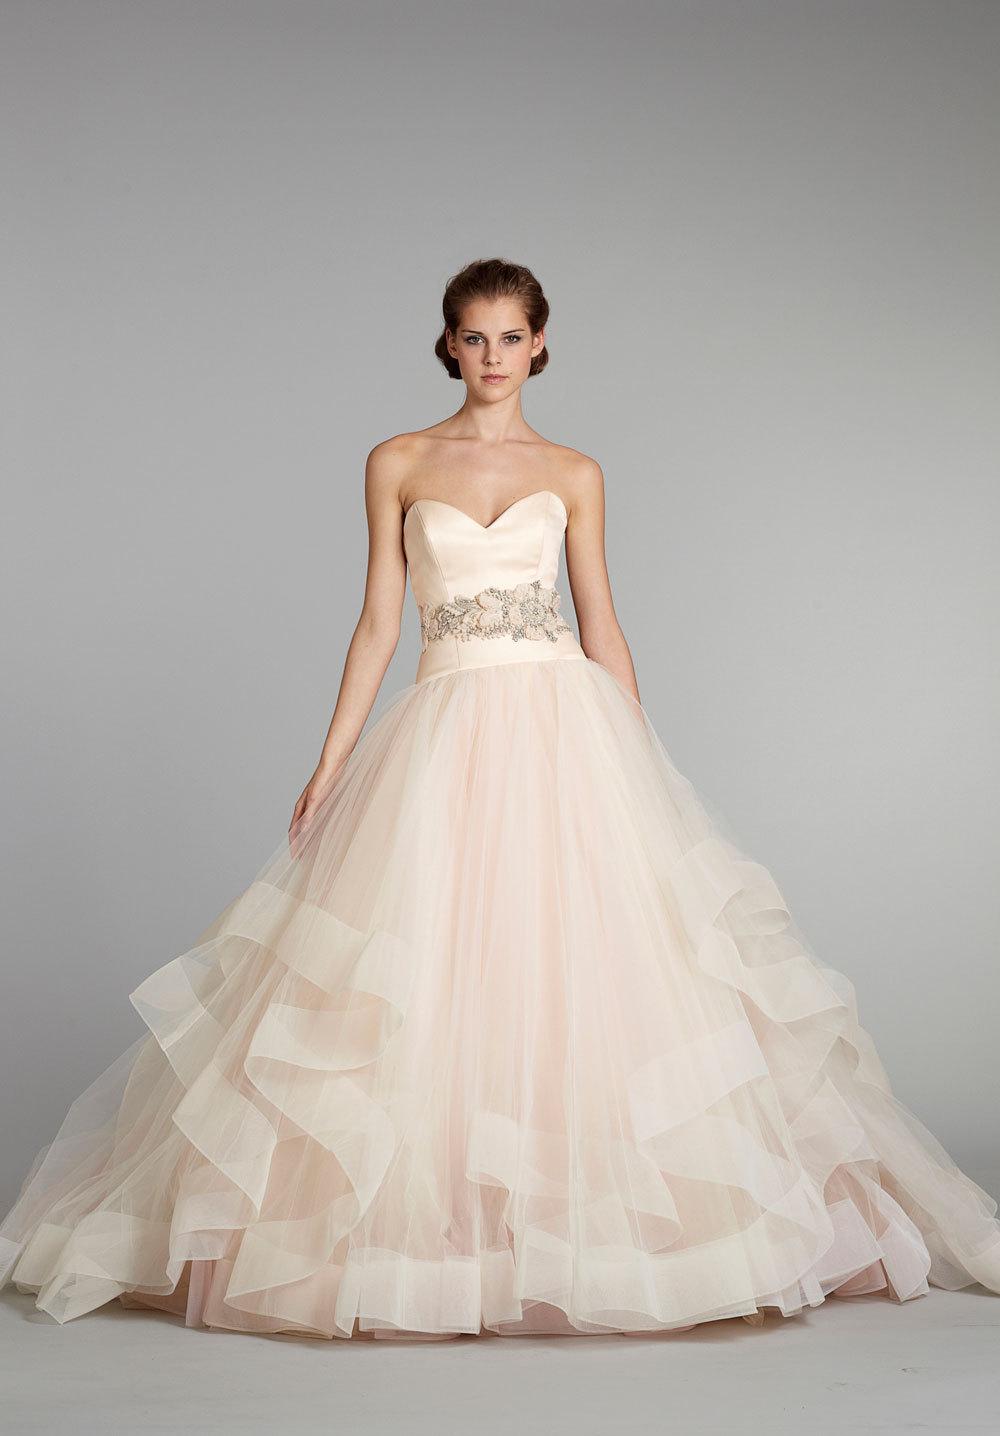 fall 2012 wedding dress Lazaro bridal gowns 3250 ballgown sweetheart